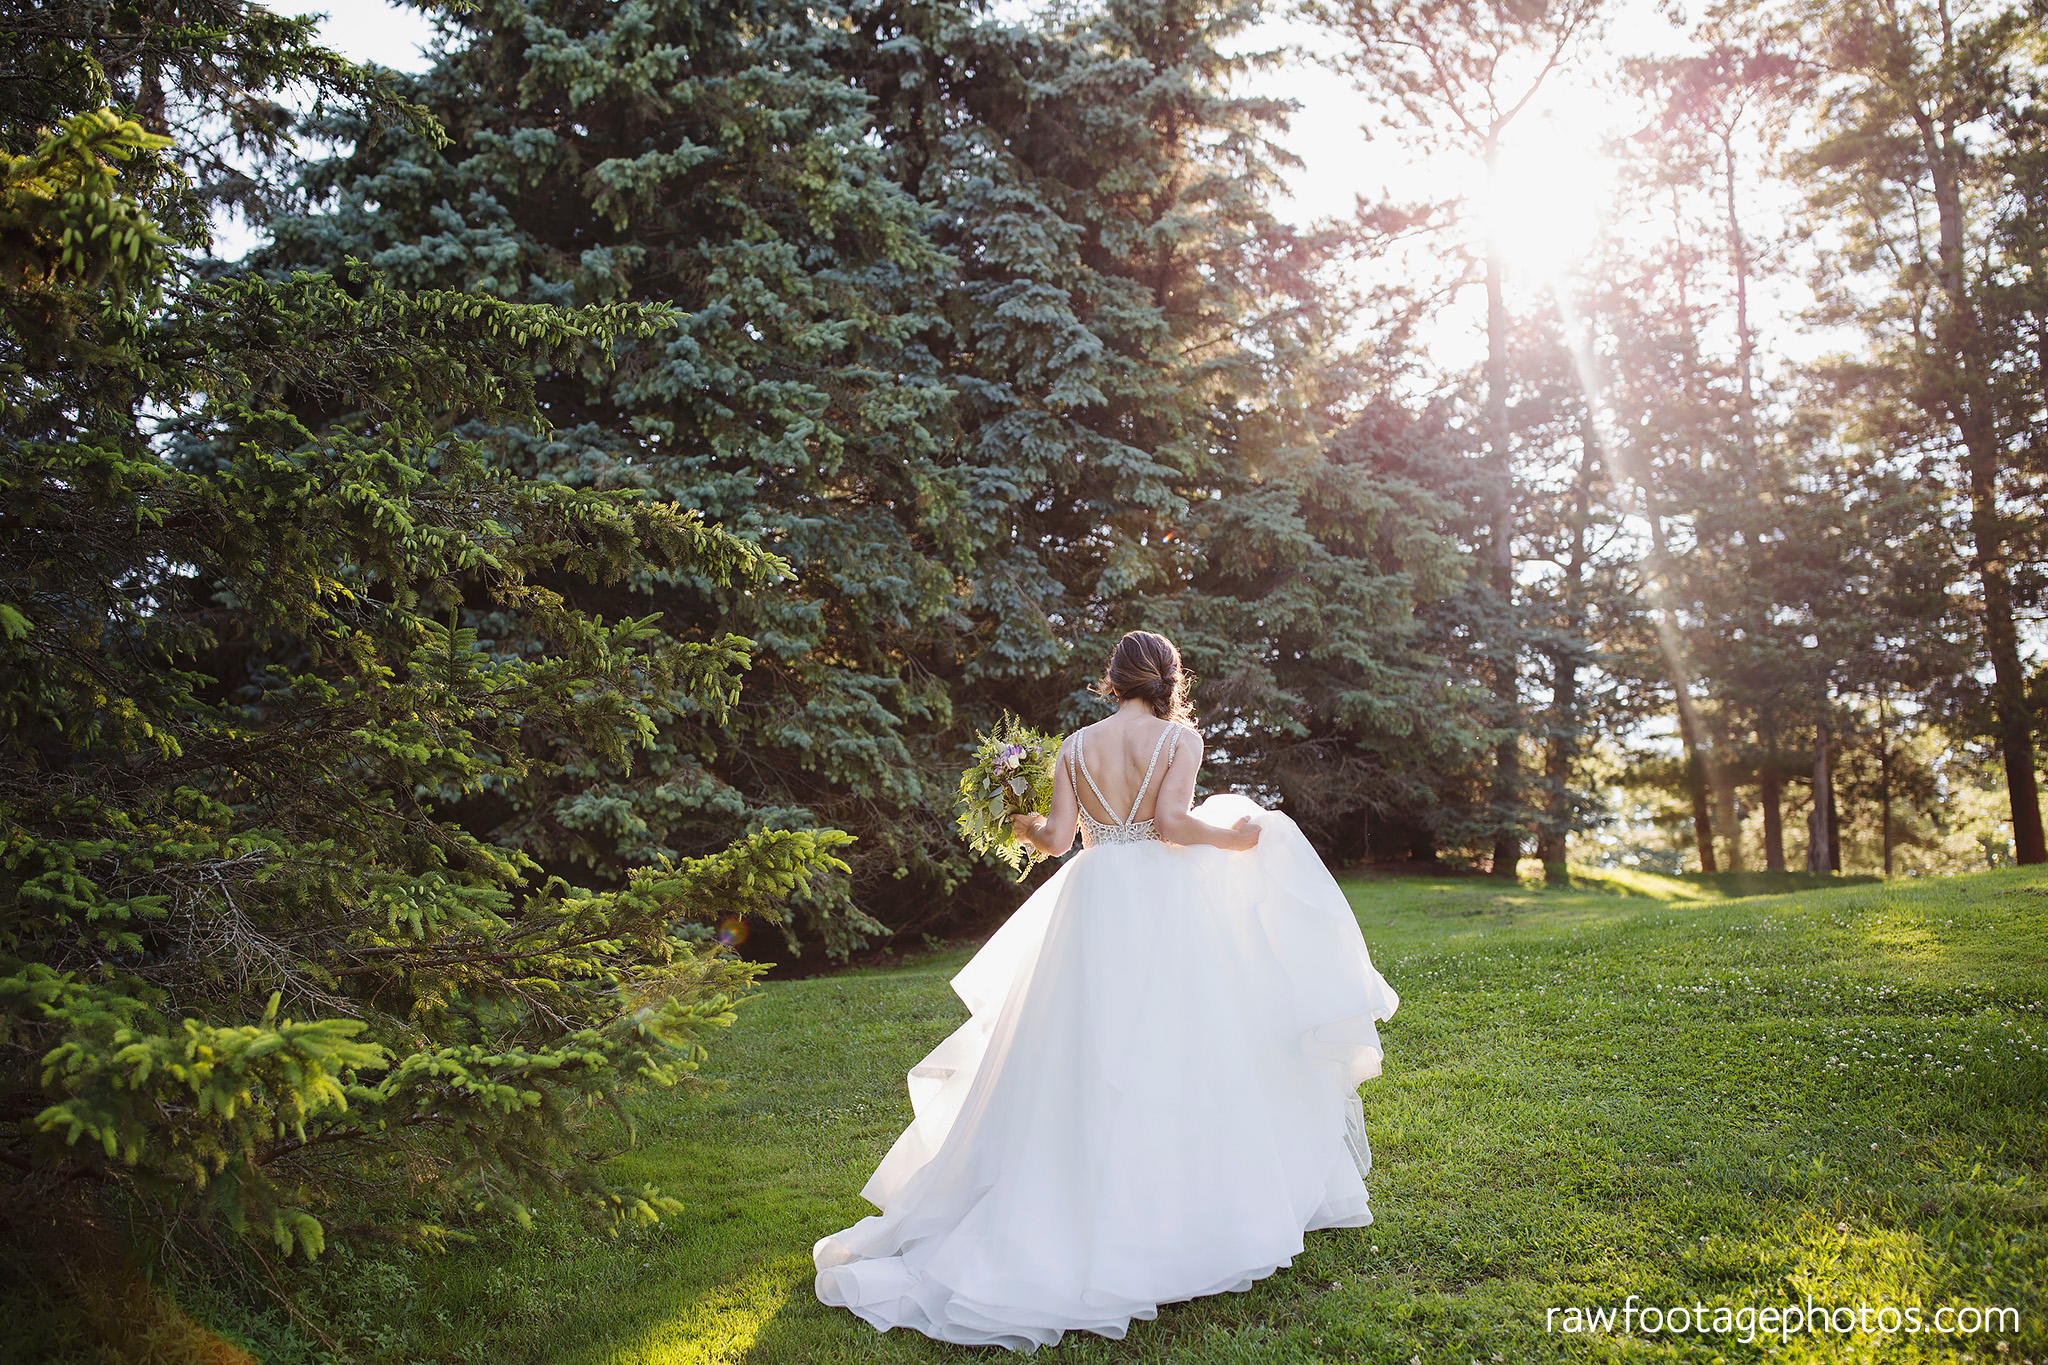 london_ontario_wedding_photographer-grand_bend_wedding_photographer-oakwood_resort_wedding-beach_wedding-sunset_wedding-raw_footage_photography056.jpg